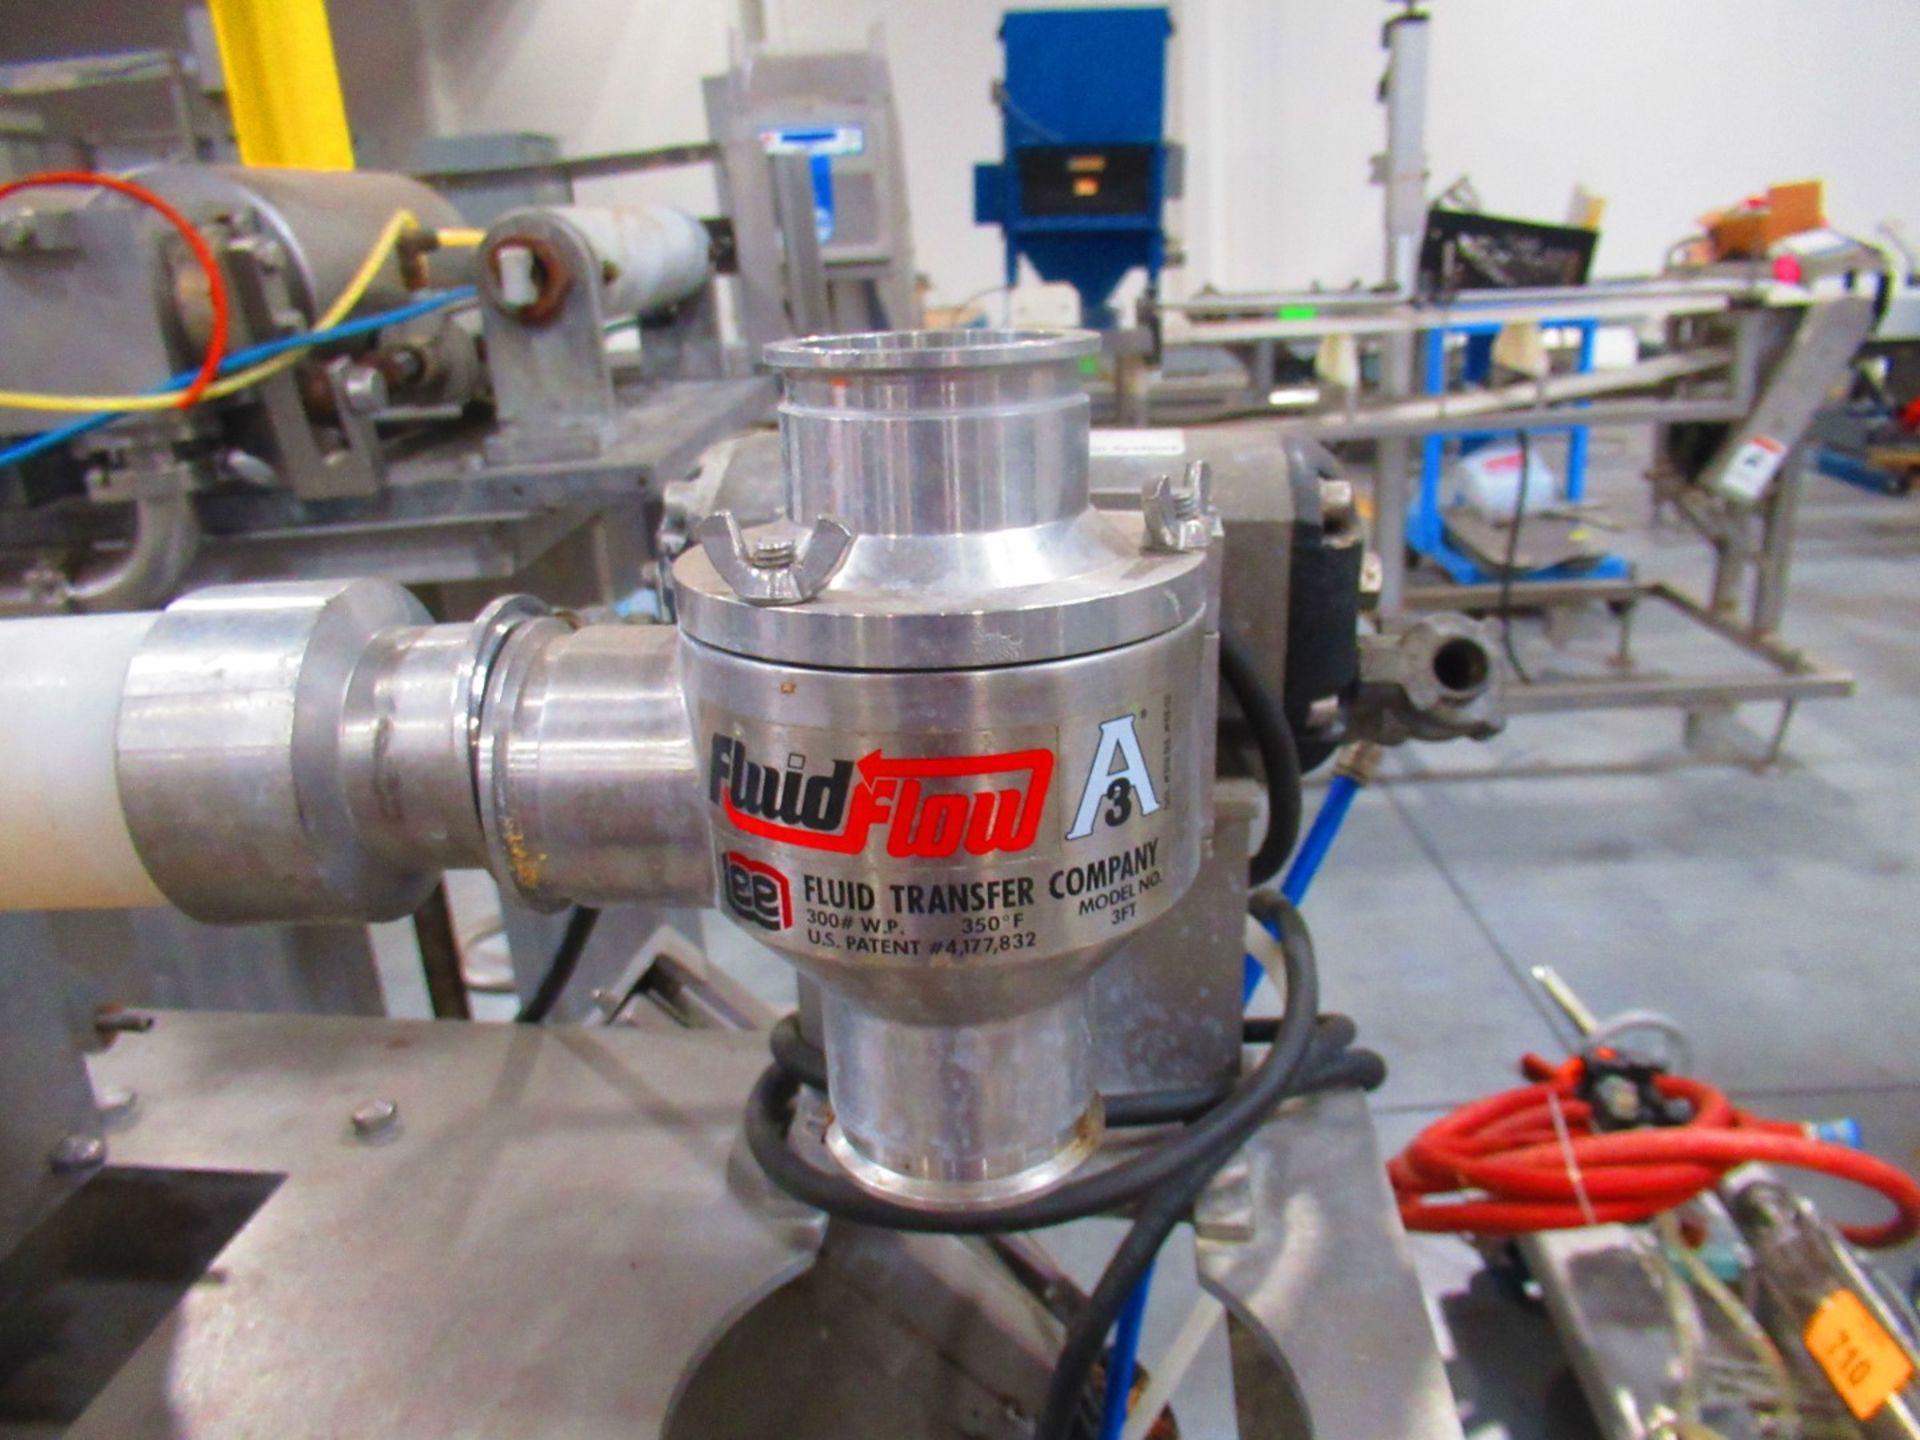 Liquid Metal Detector - Image 3 of 9